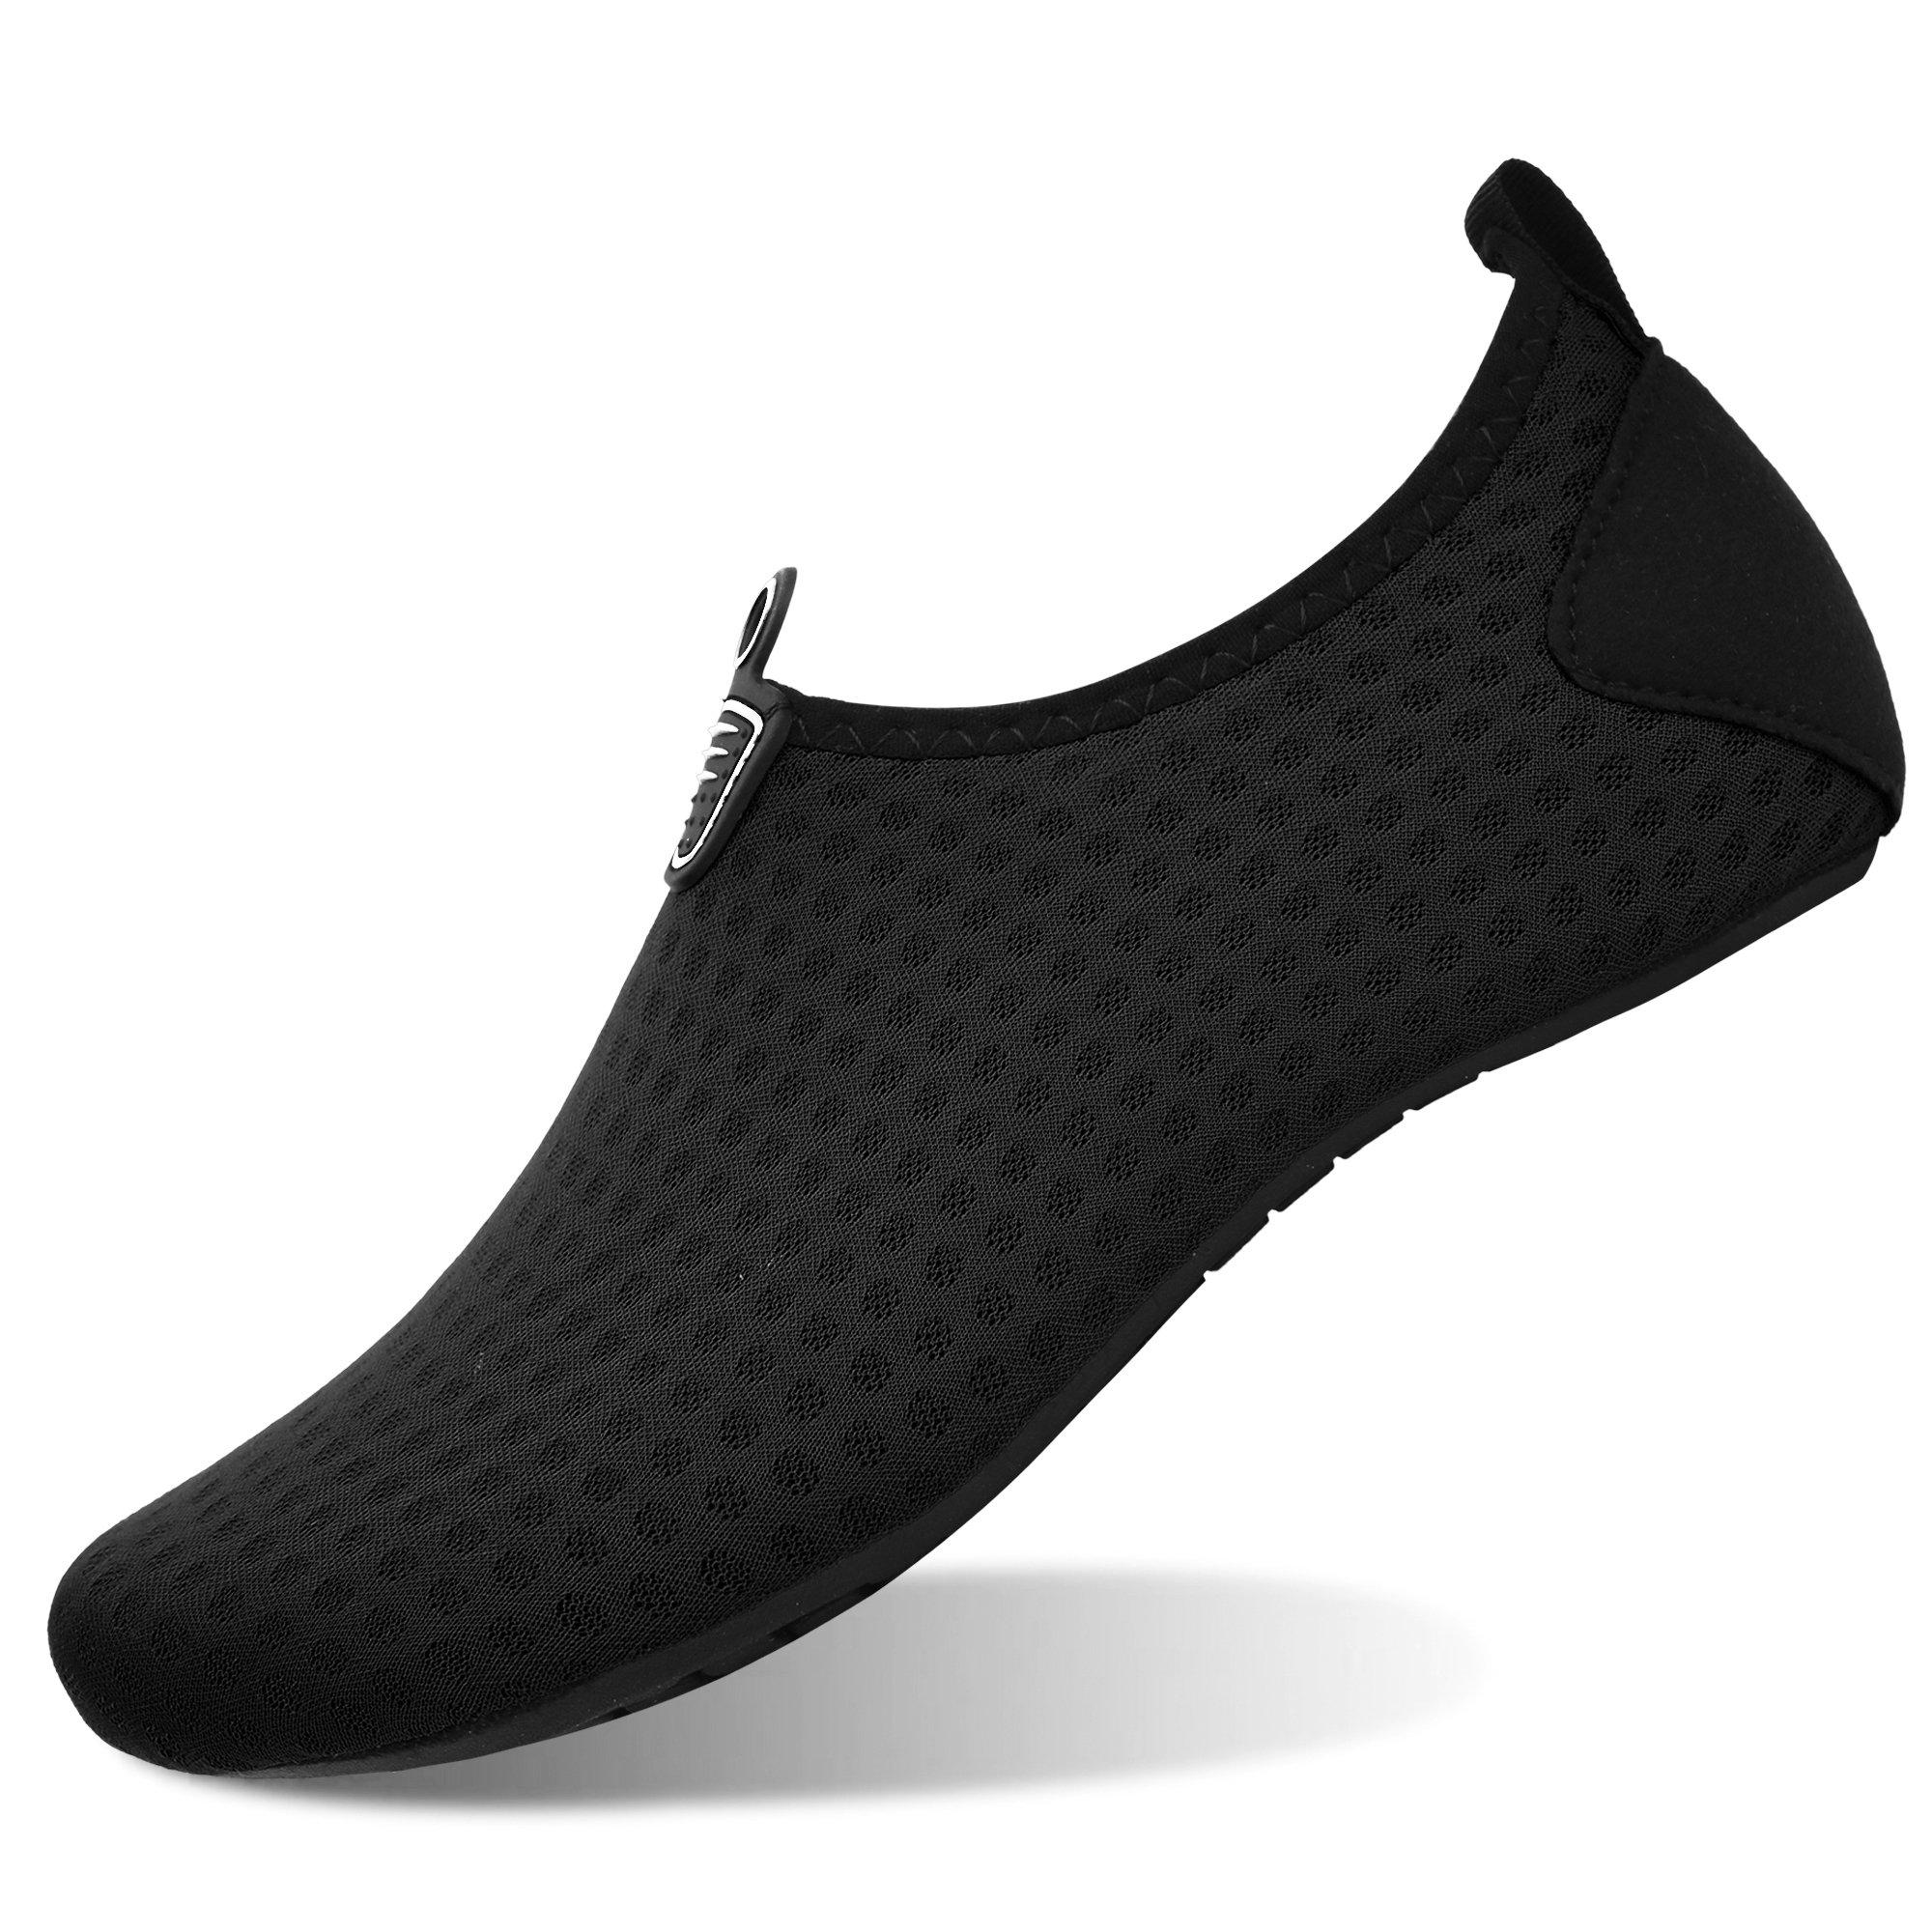 MoreDays Non-Slip Water Sport Shoes Light Barefoot Quick Dry Aqua Socks for Beach Pool Swimming Yoga Exercise Black 2XL